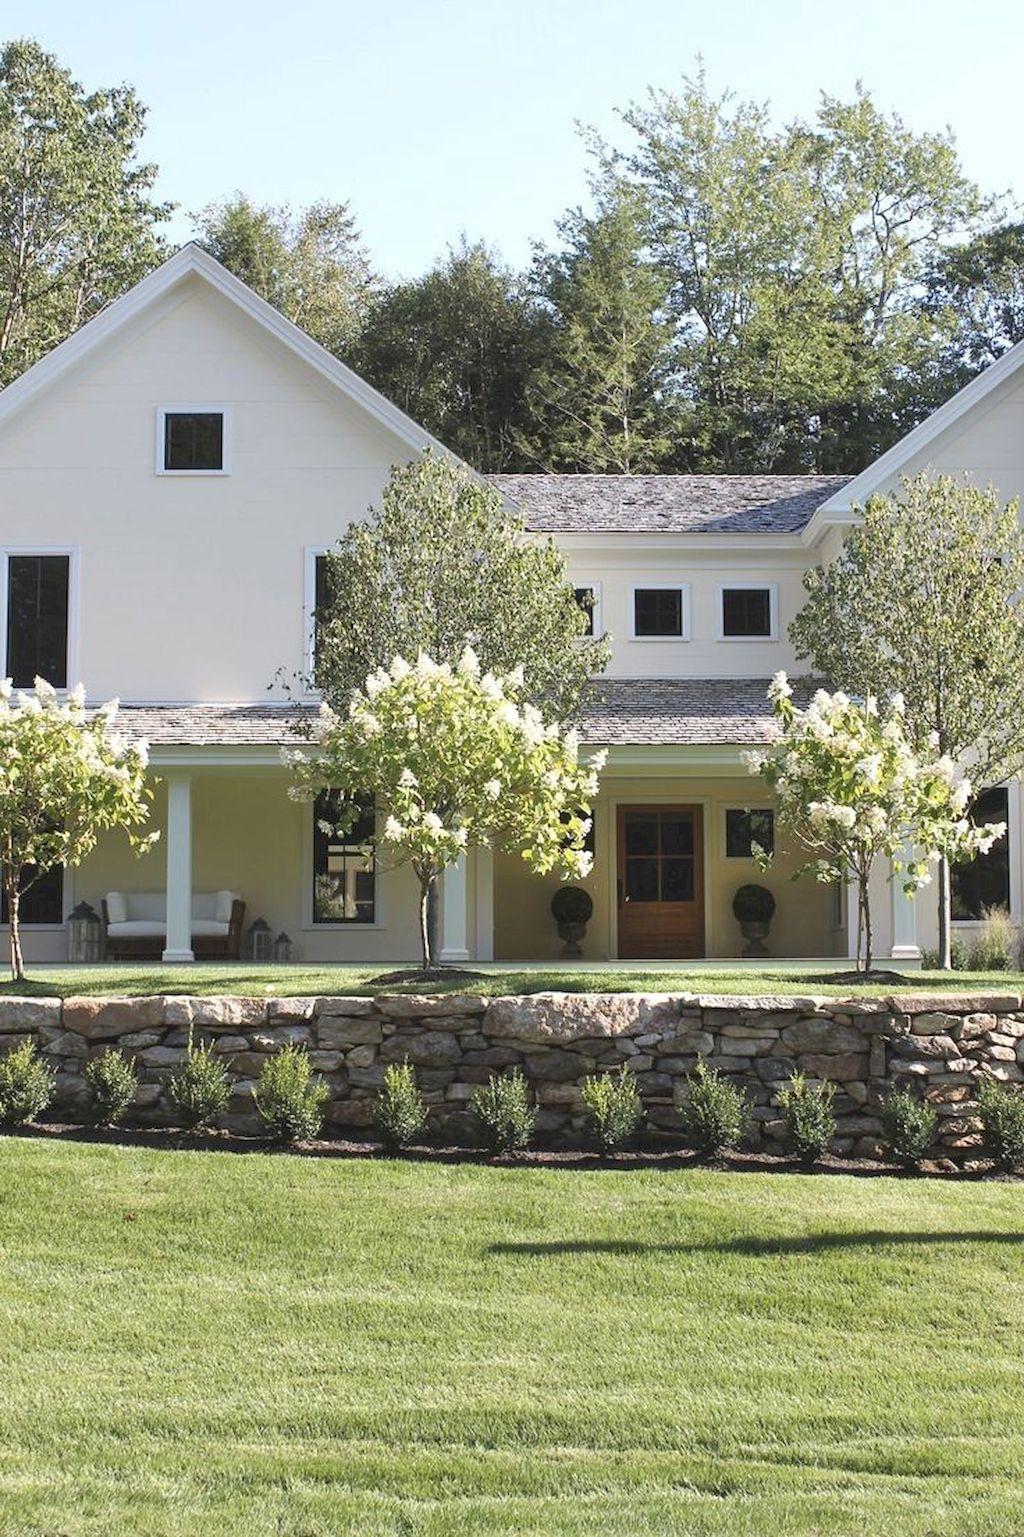 Oneonroom Com Farmhouse Landscaping House Landscape Front Yard Design Farmhouse style backyard ideas